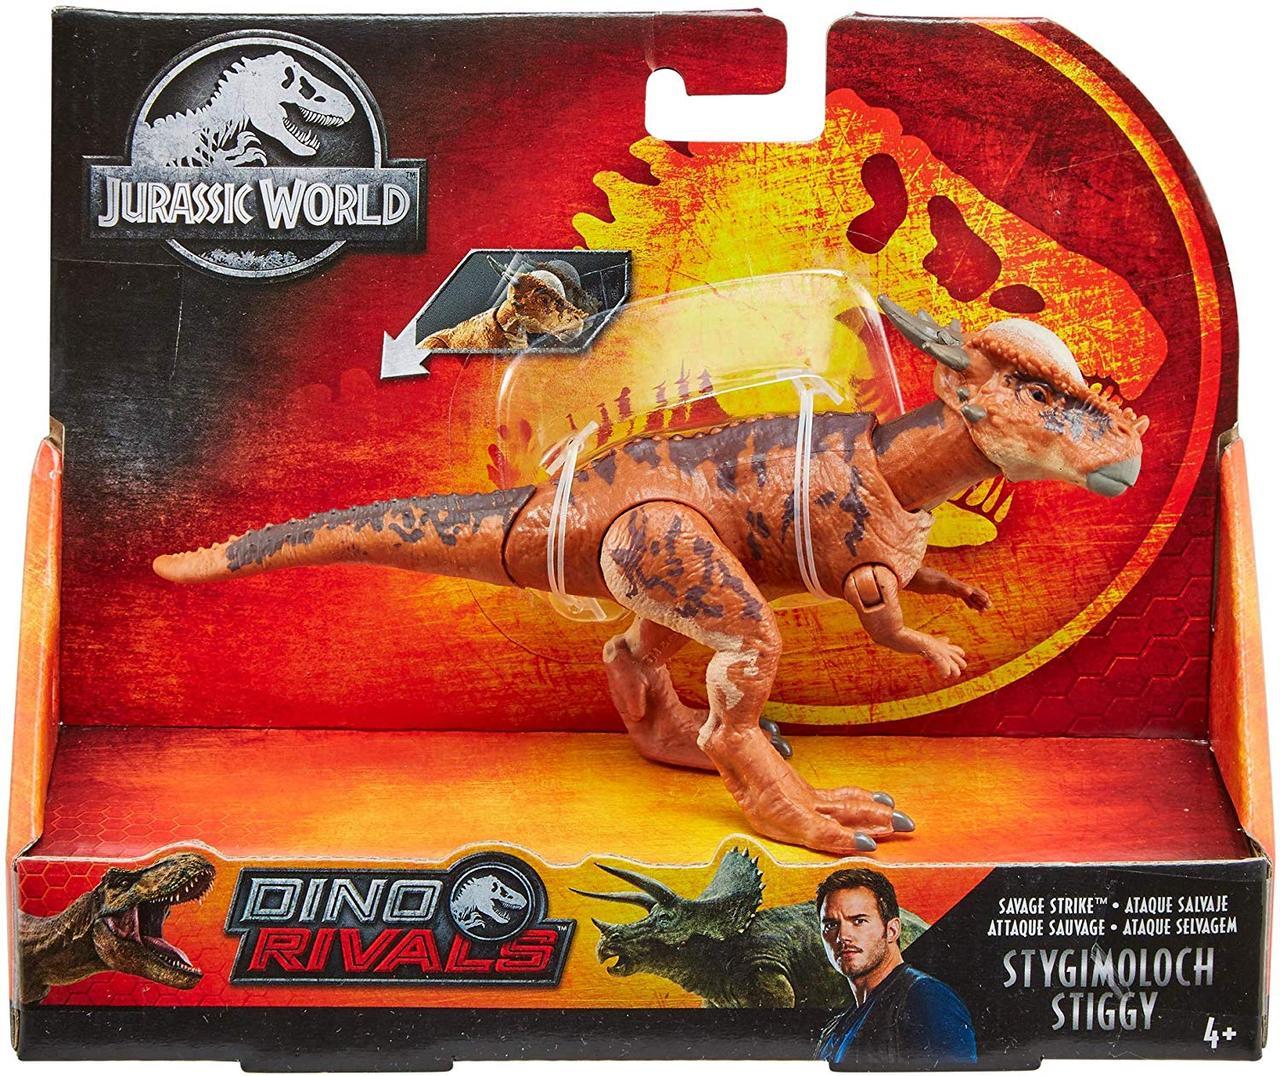 Динозавр Мир Юрского Периода 2: Стигимолох. Jurassic World: Fallen Kingdom - Jurassic World Stygimoloch